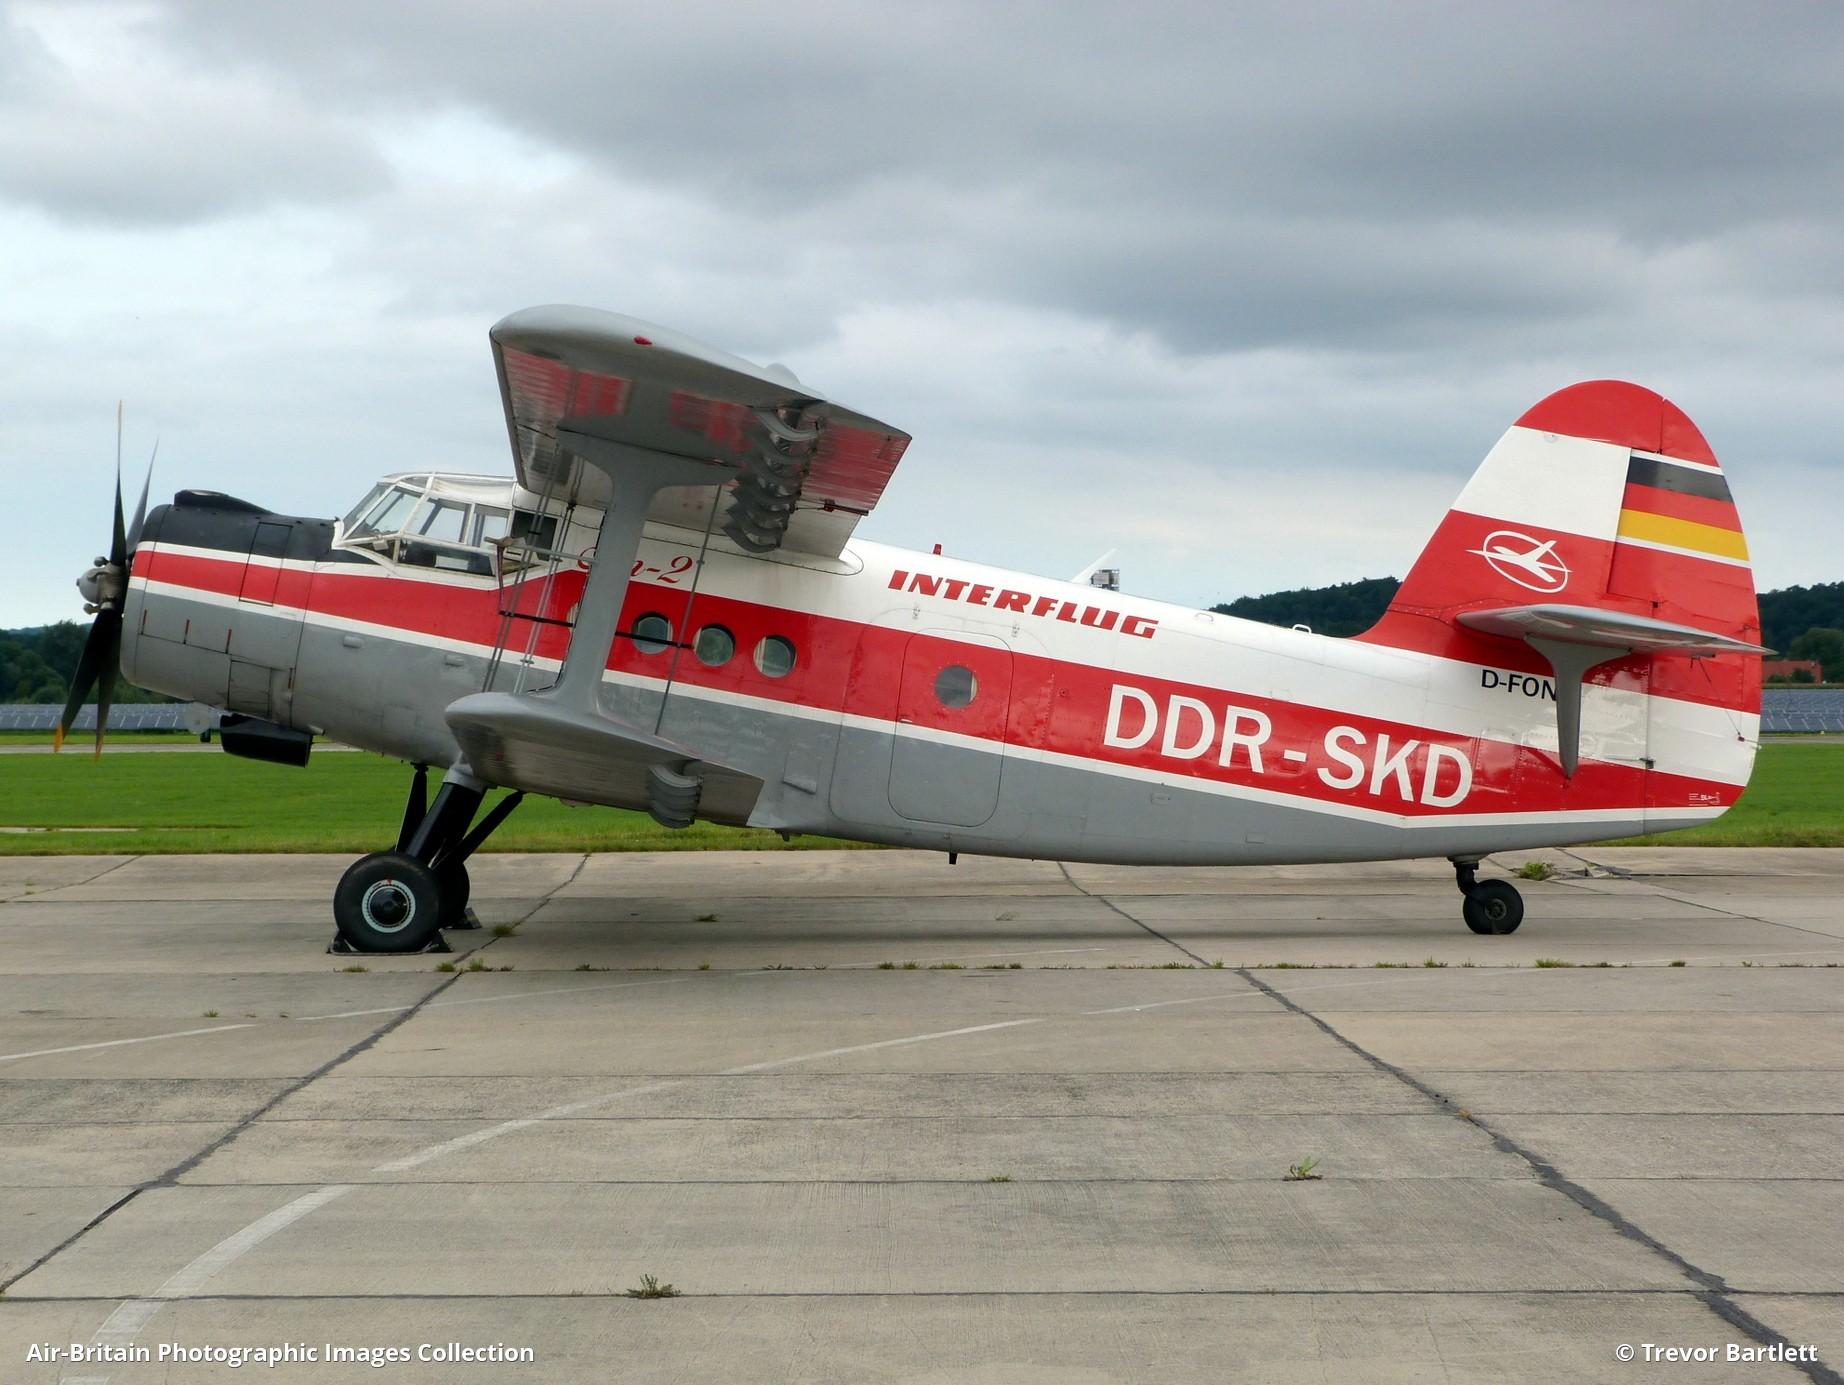 Aviation photographs of Airshow: Bitburg - Aero Expo Europe